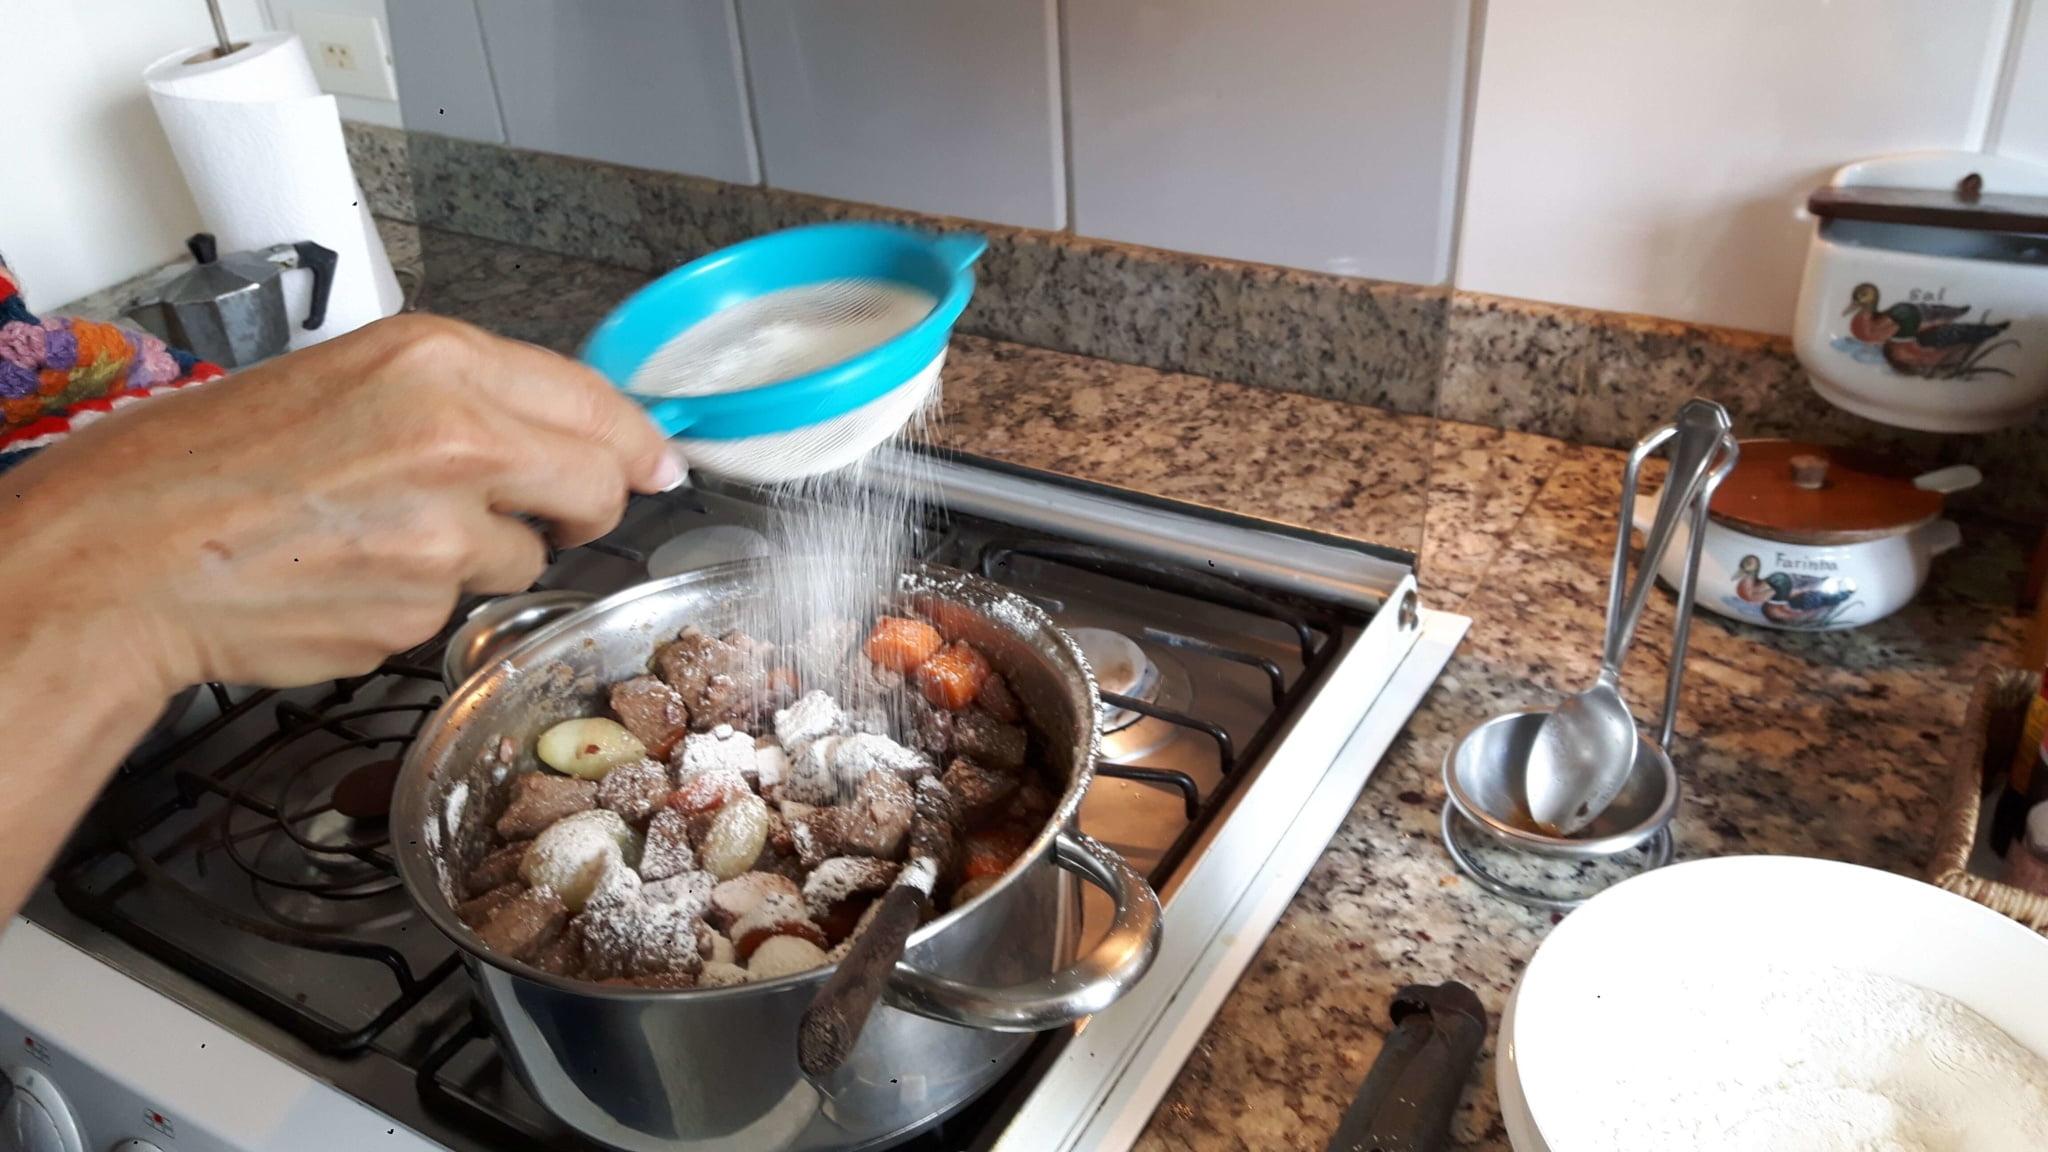 blog-da-carla-vilhena-boeuf-borguignon (11)